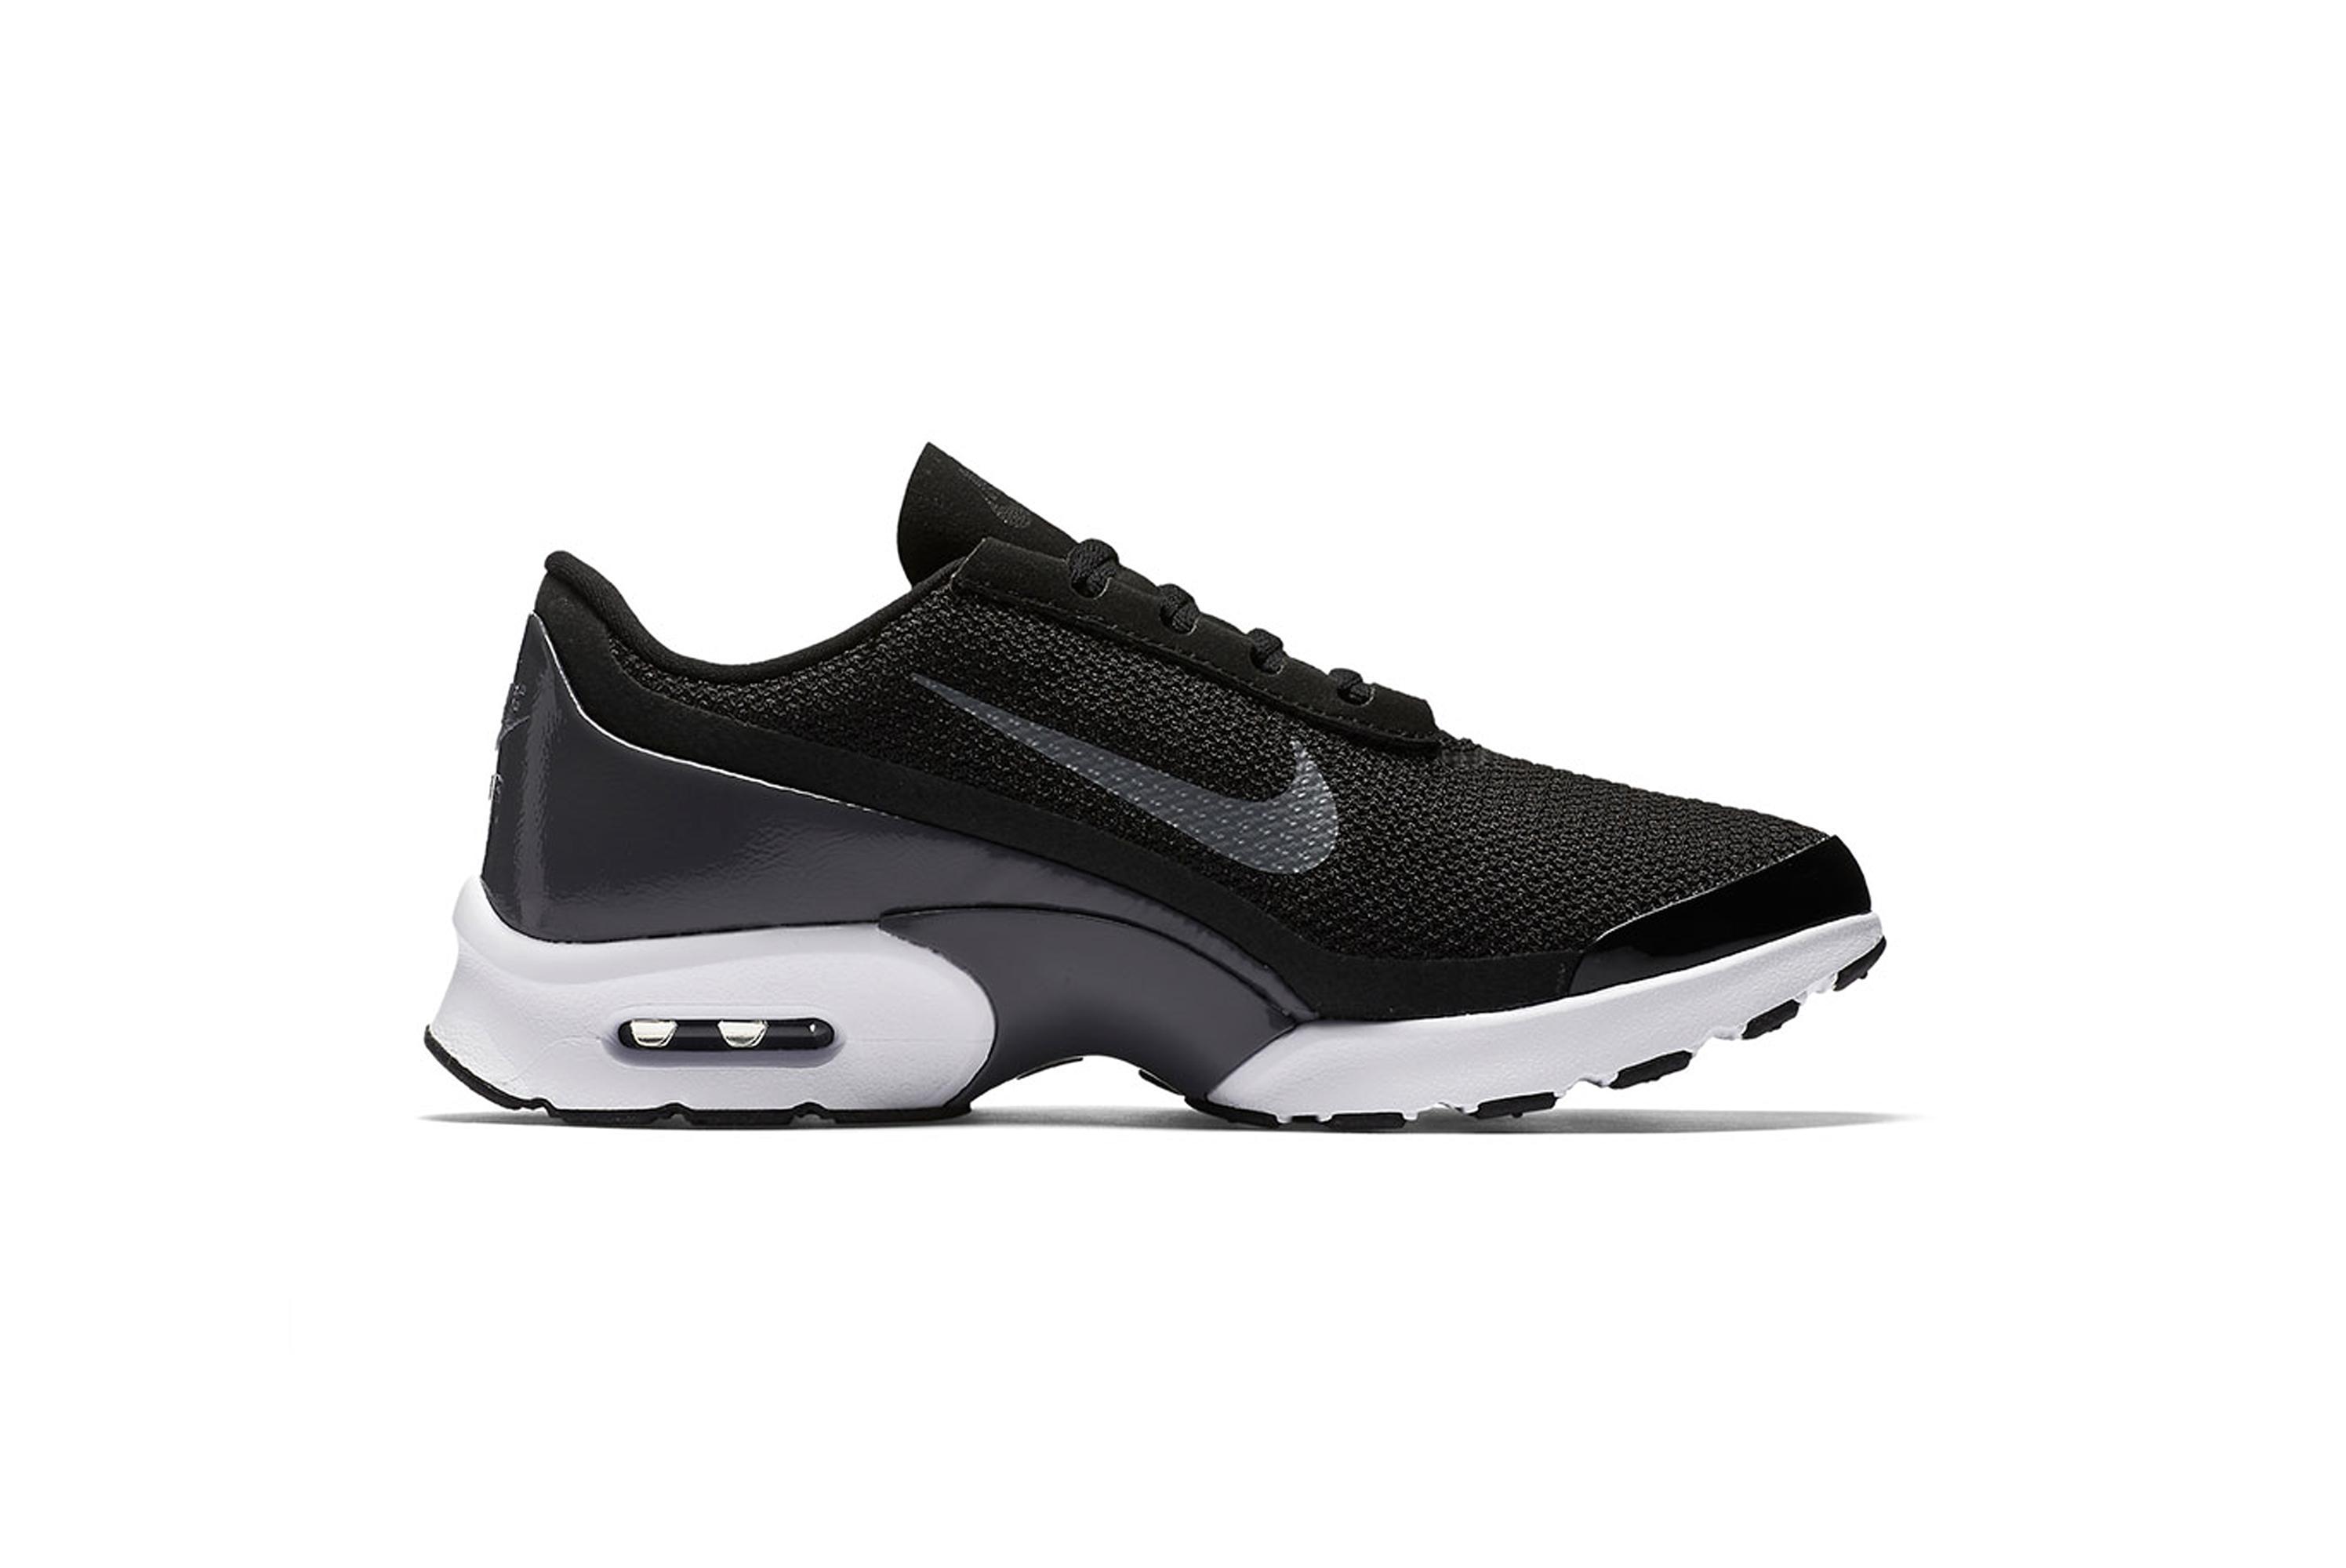 cd63bafd35b356 Latest DKNY,Nike Women's Sports Sneakers Products | Enjoy Huge ...